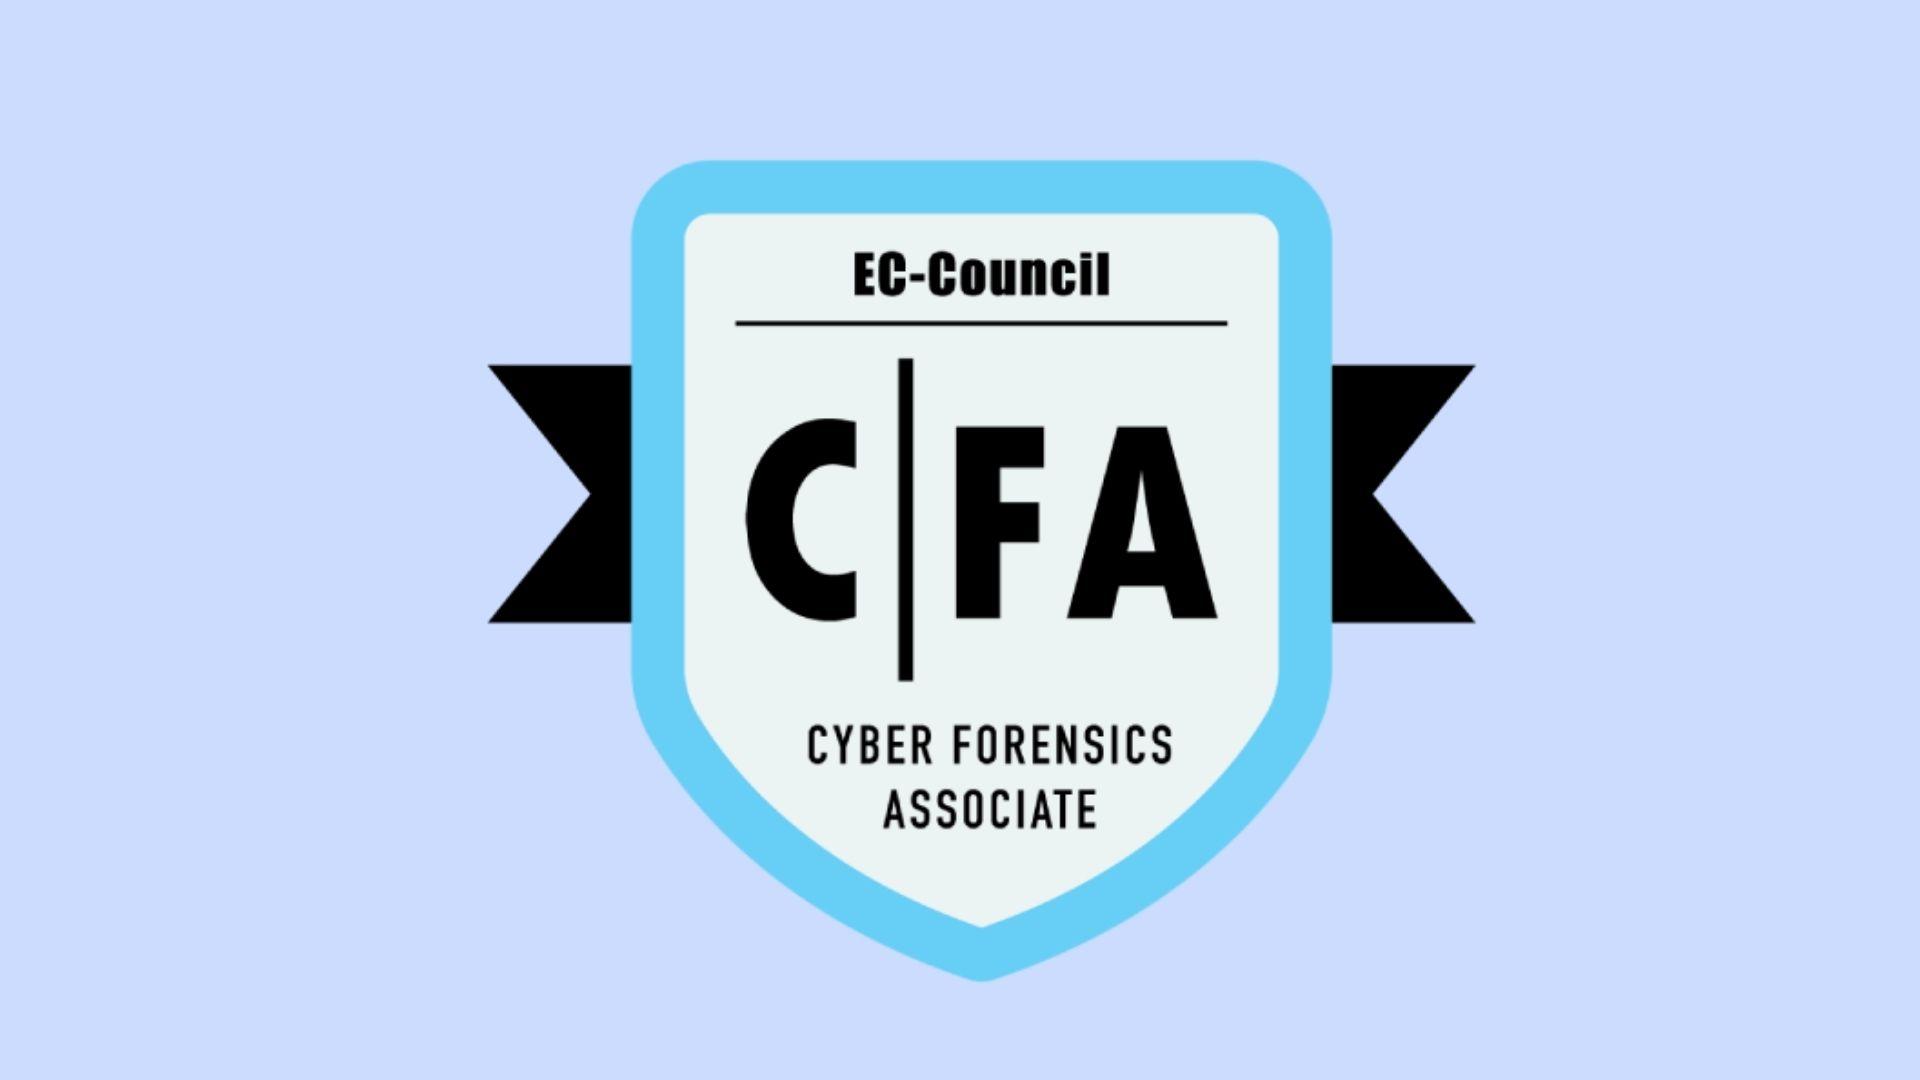 Cyber Forensics Associate